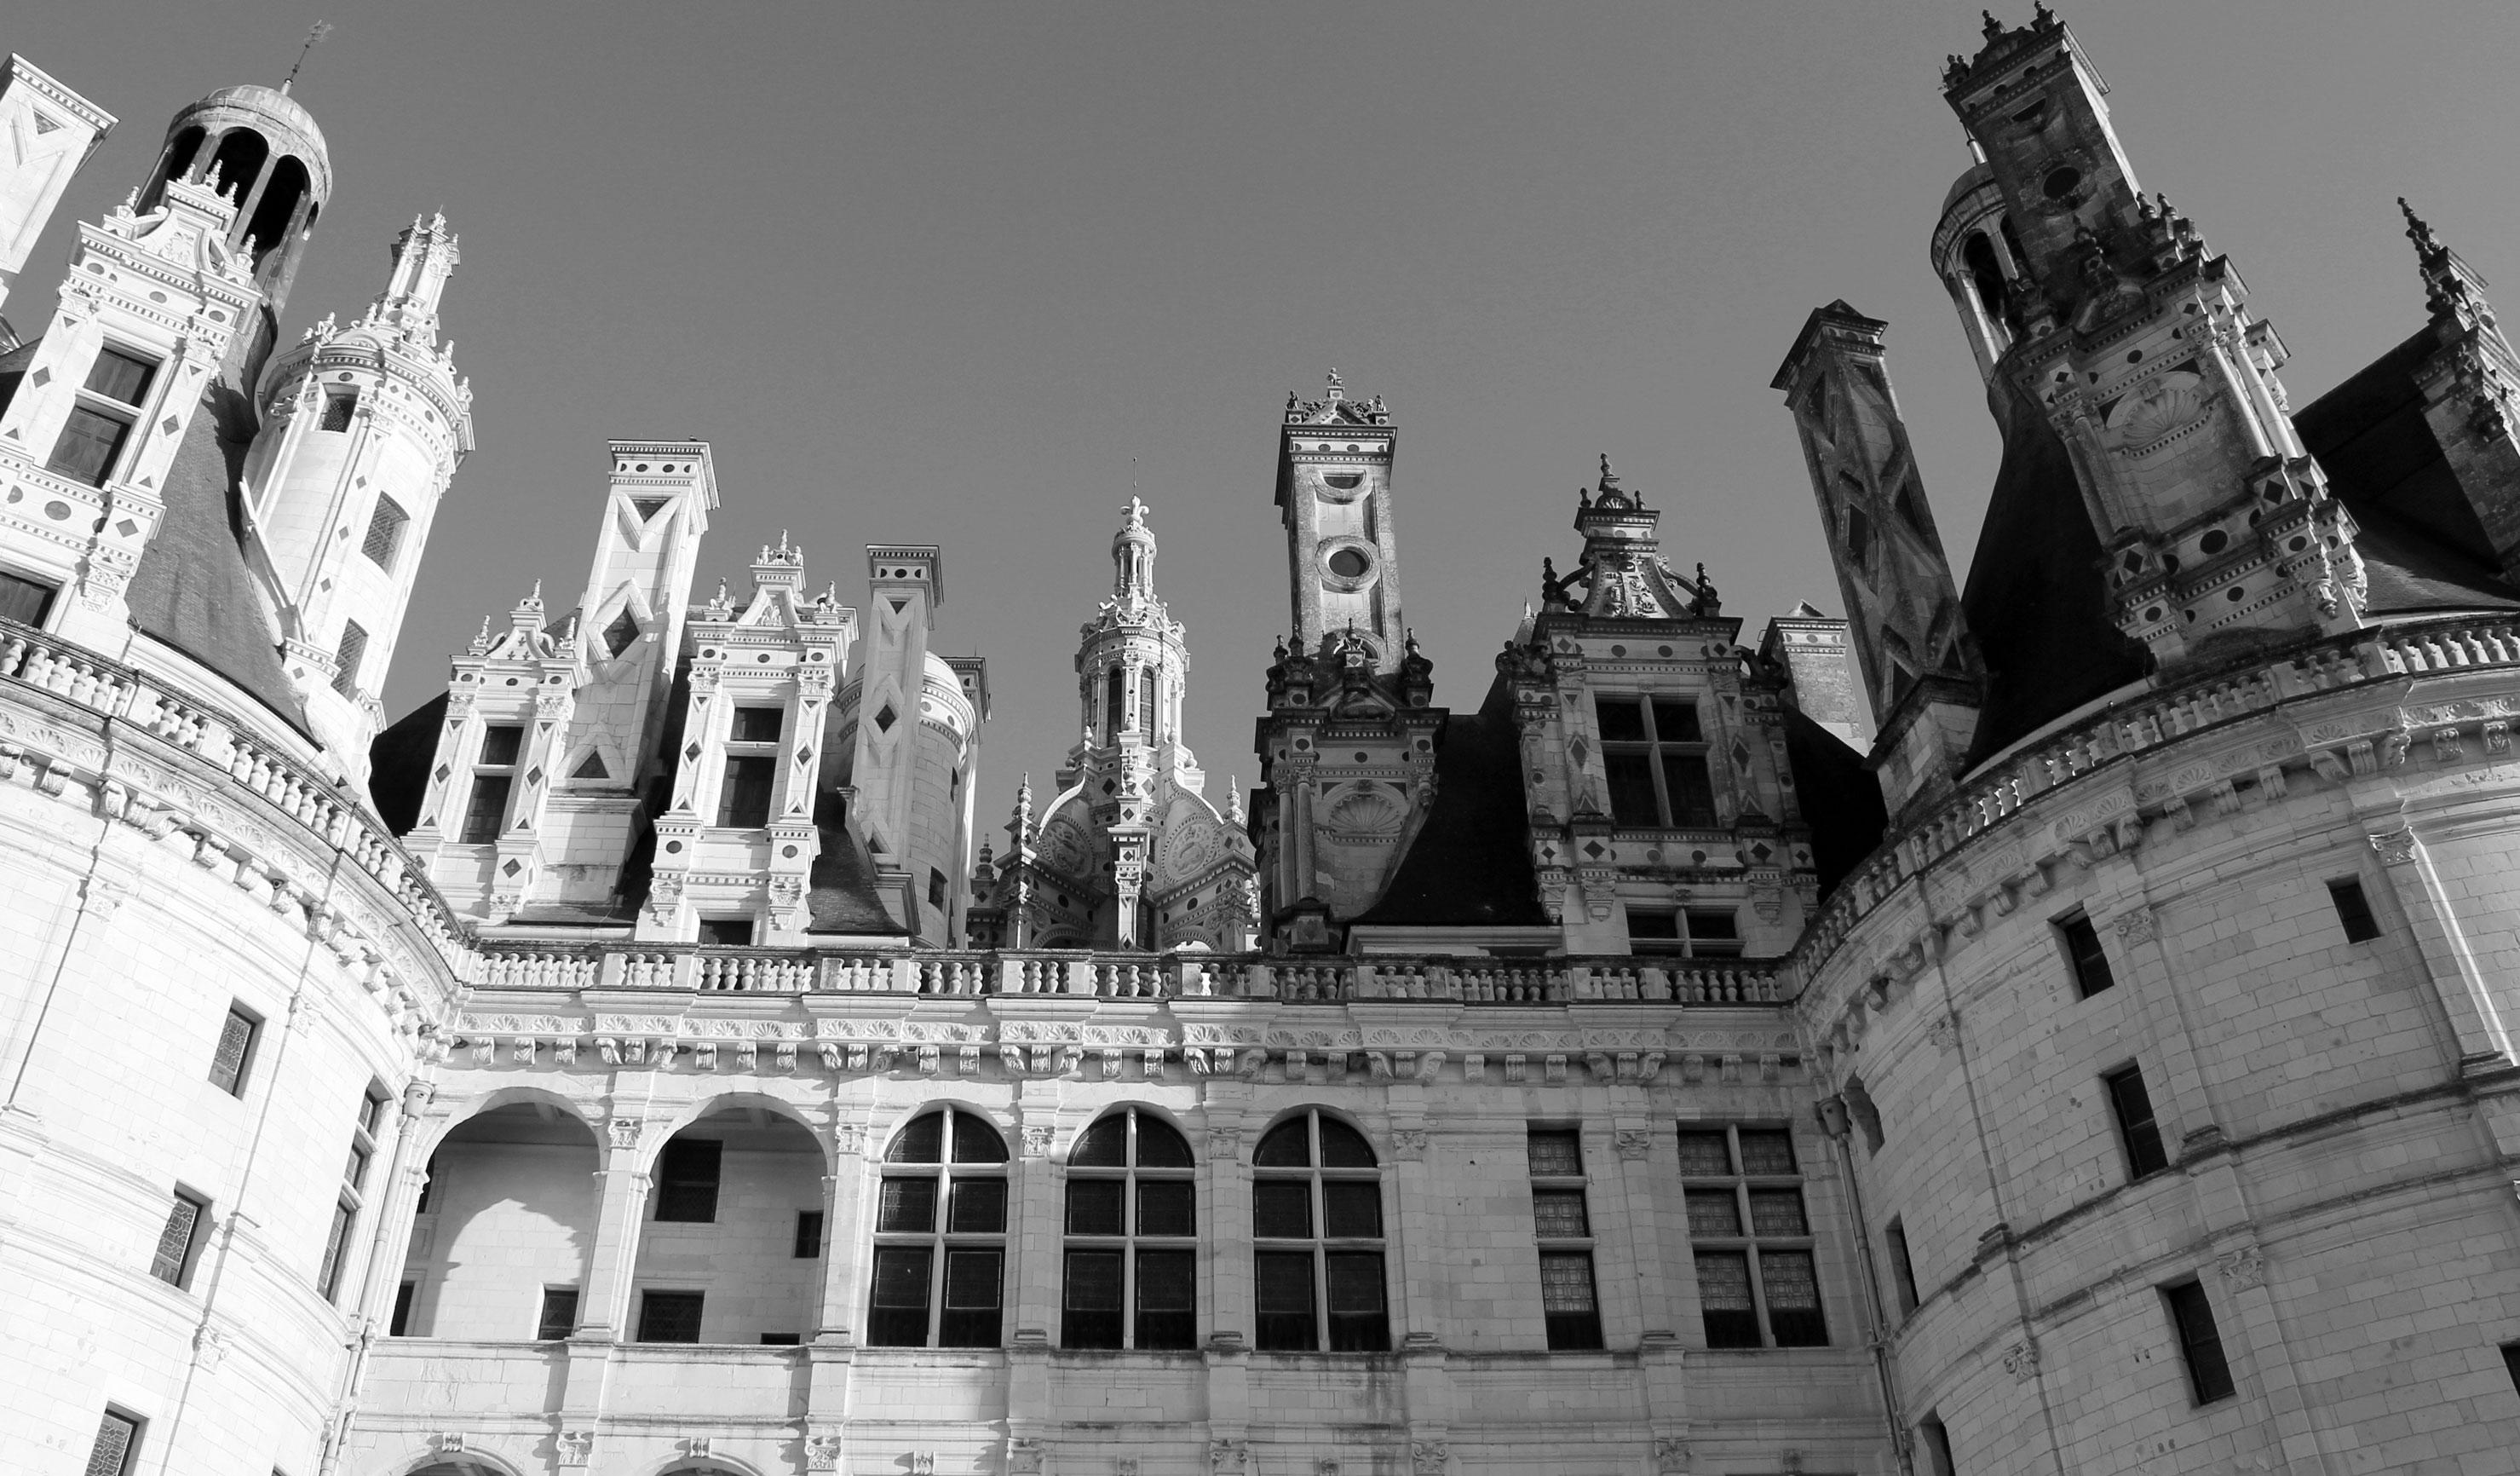 https://ufe-experts.fr/wp-content/uploads/2019/08/6-Vue-du-château-de-Chambord.jpg